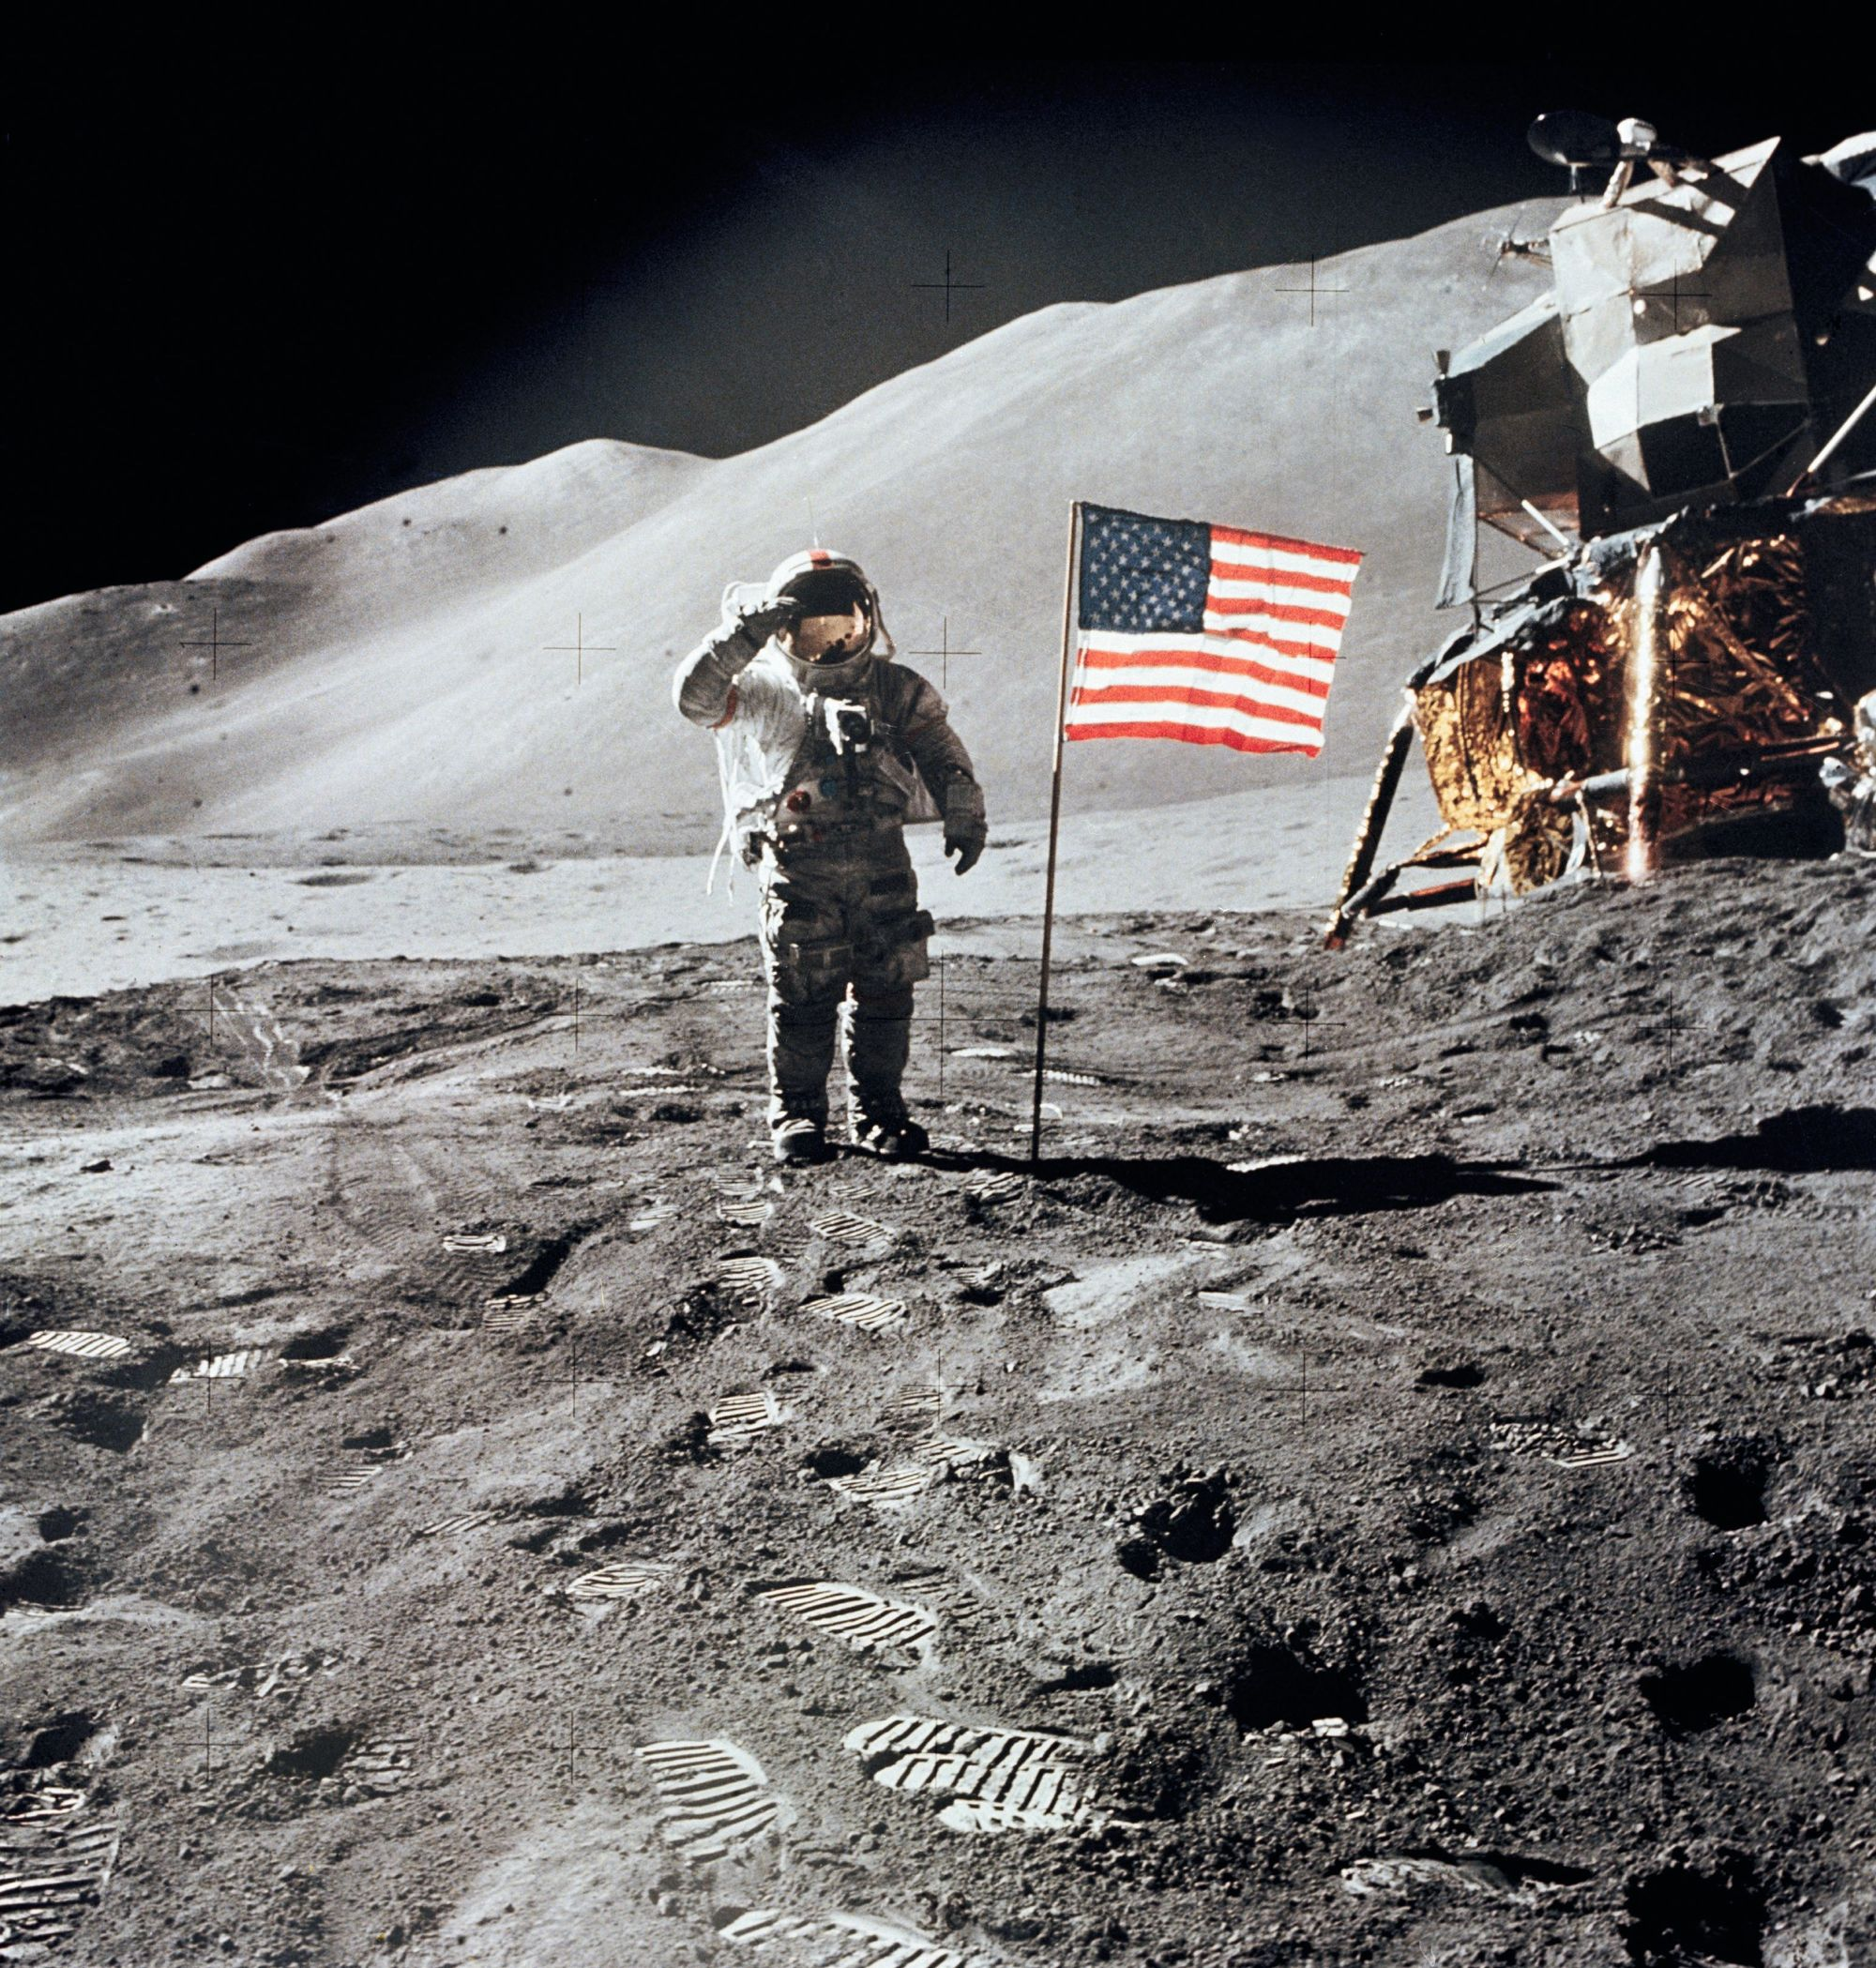 L'astronaute David Scott